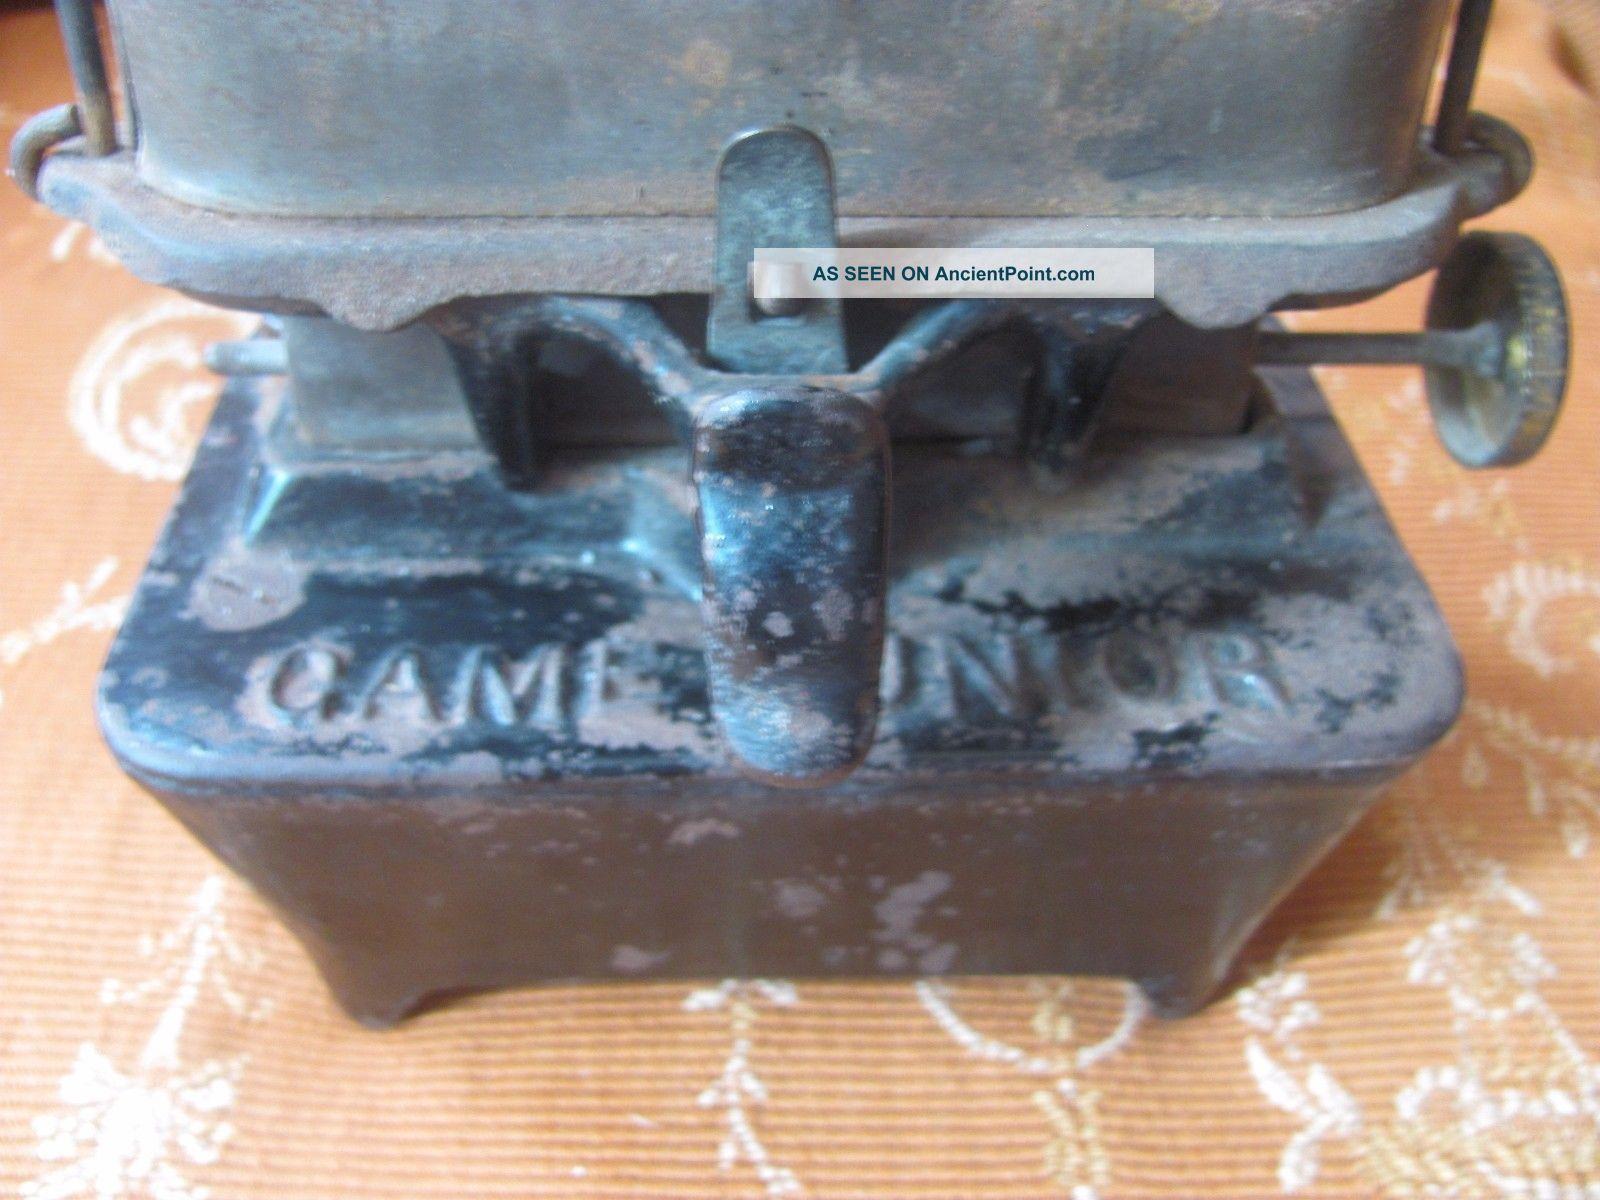 Antique Cast Iron Game Jr No 1 Camp Railroad Sad Iron